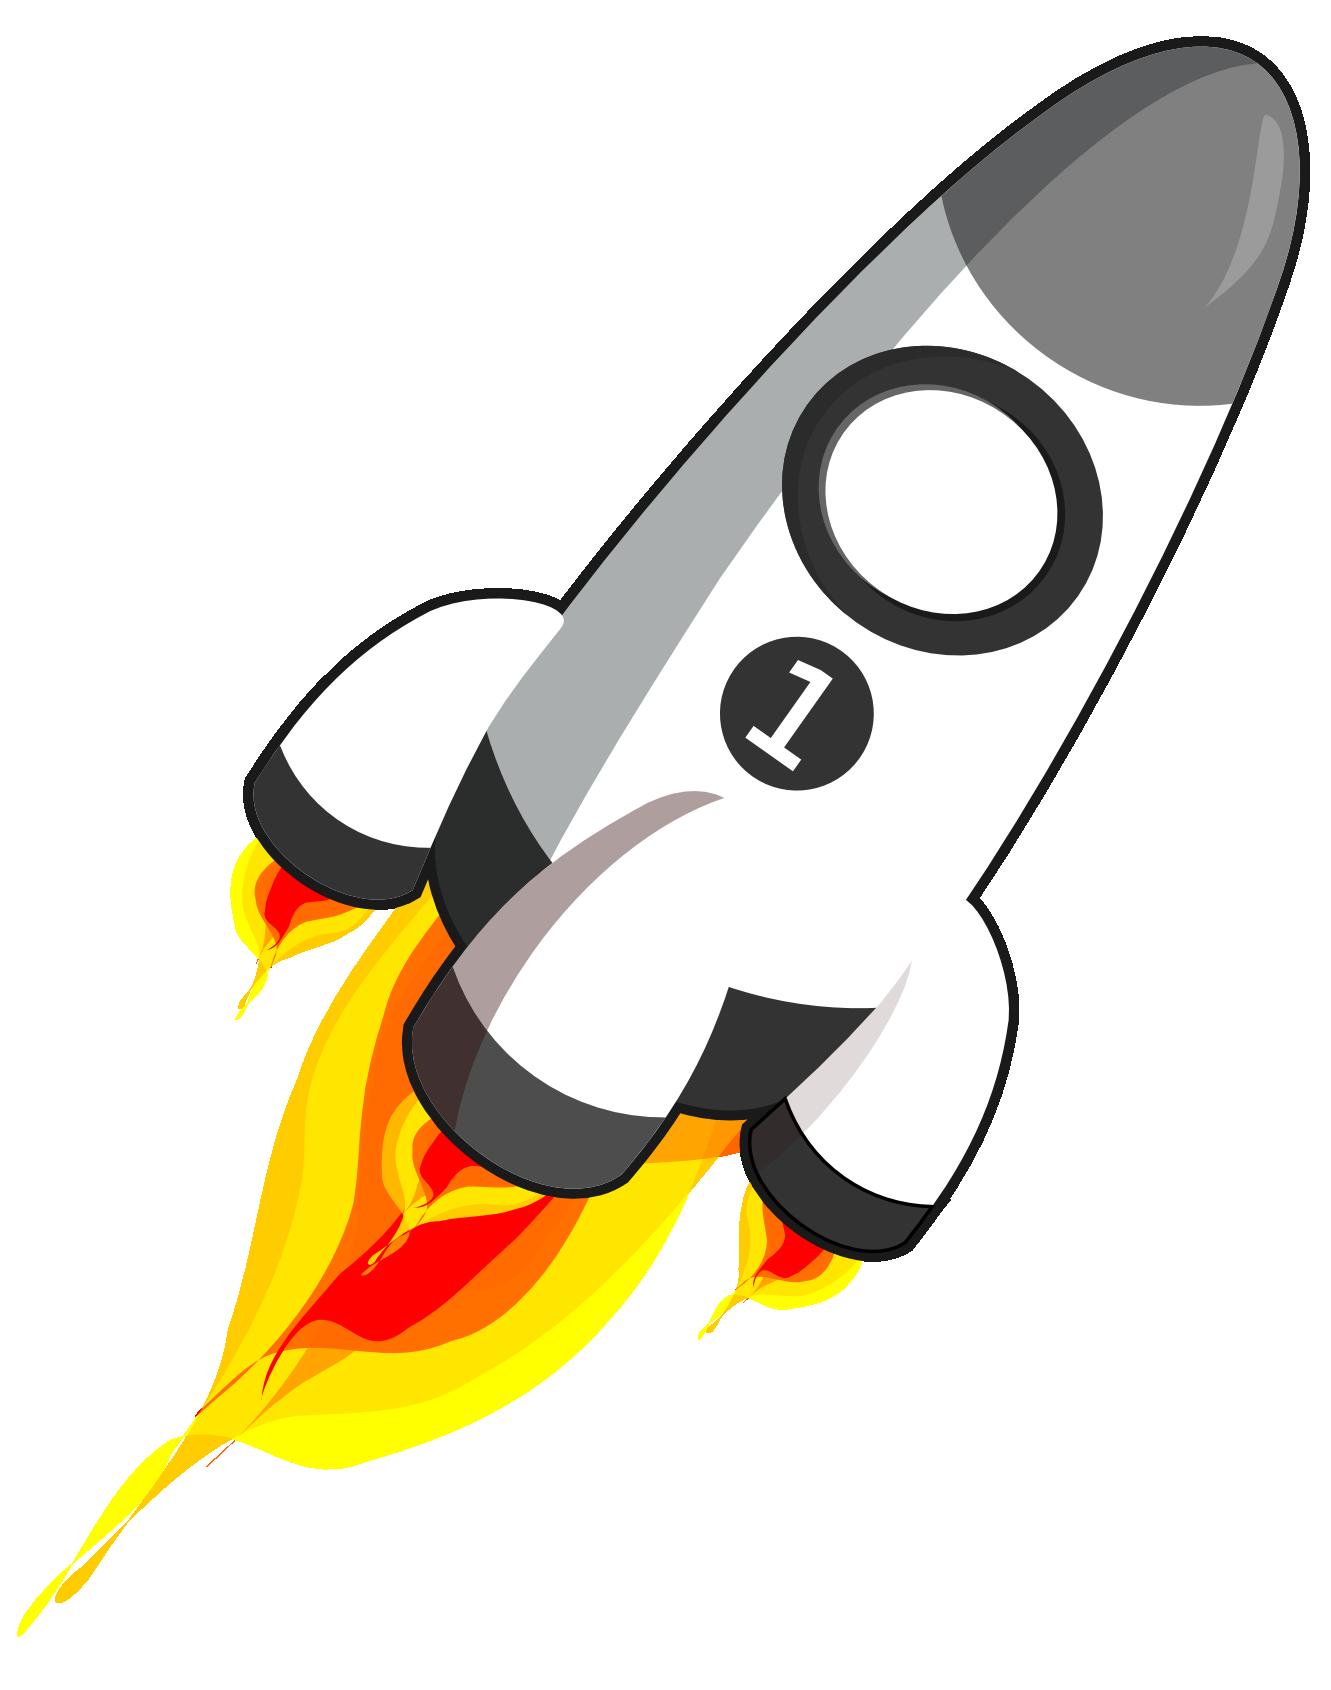 Cartoon Image Of Rocket-Cartoon Image Of Rocket-0